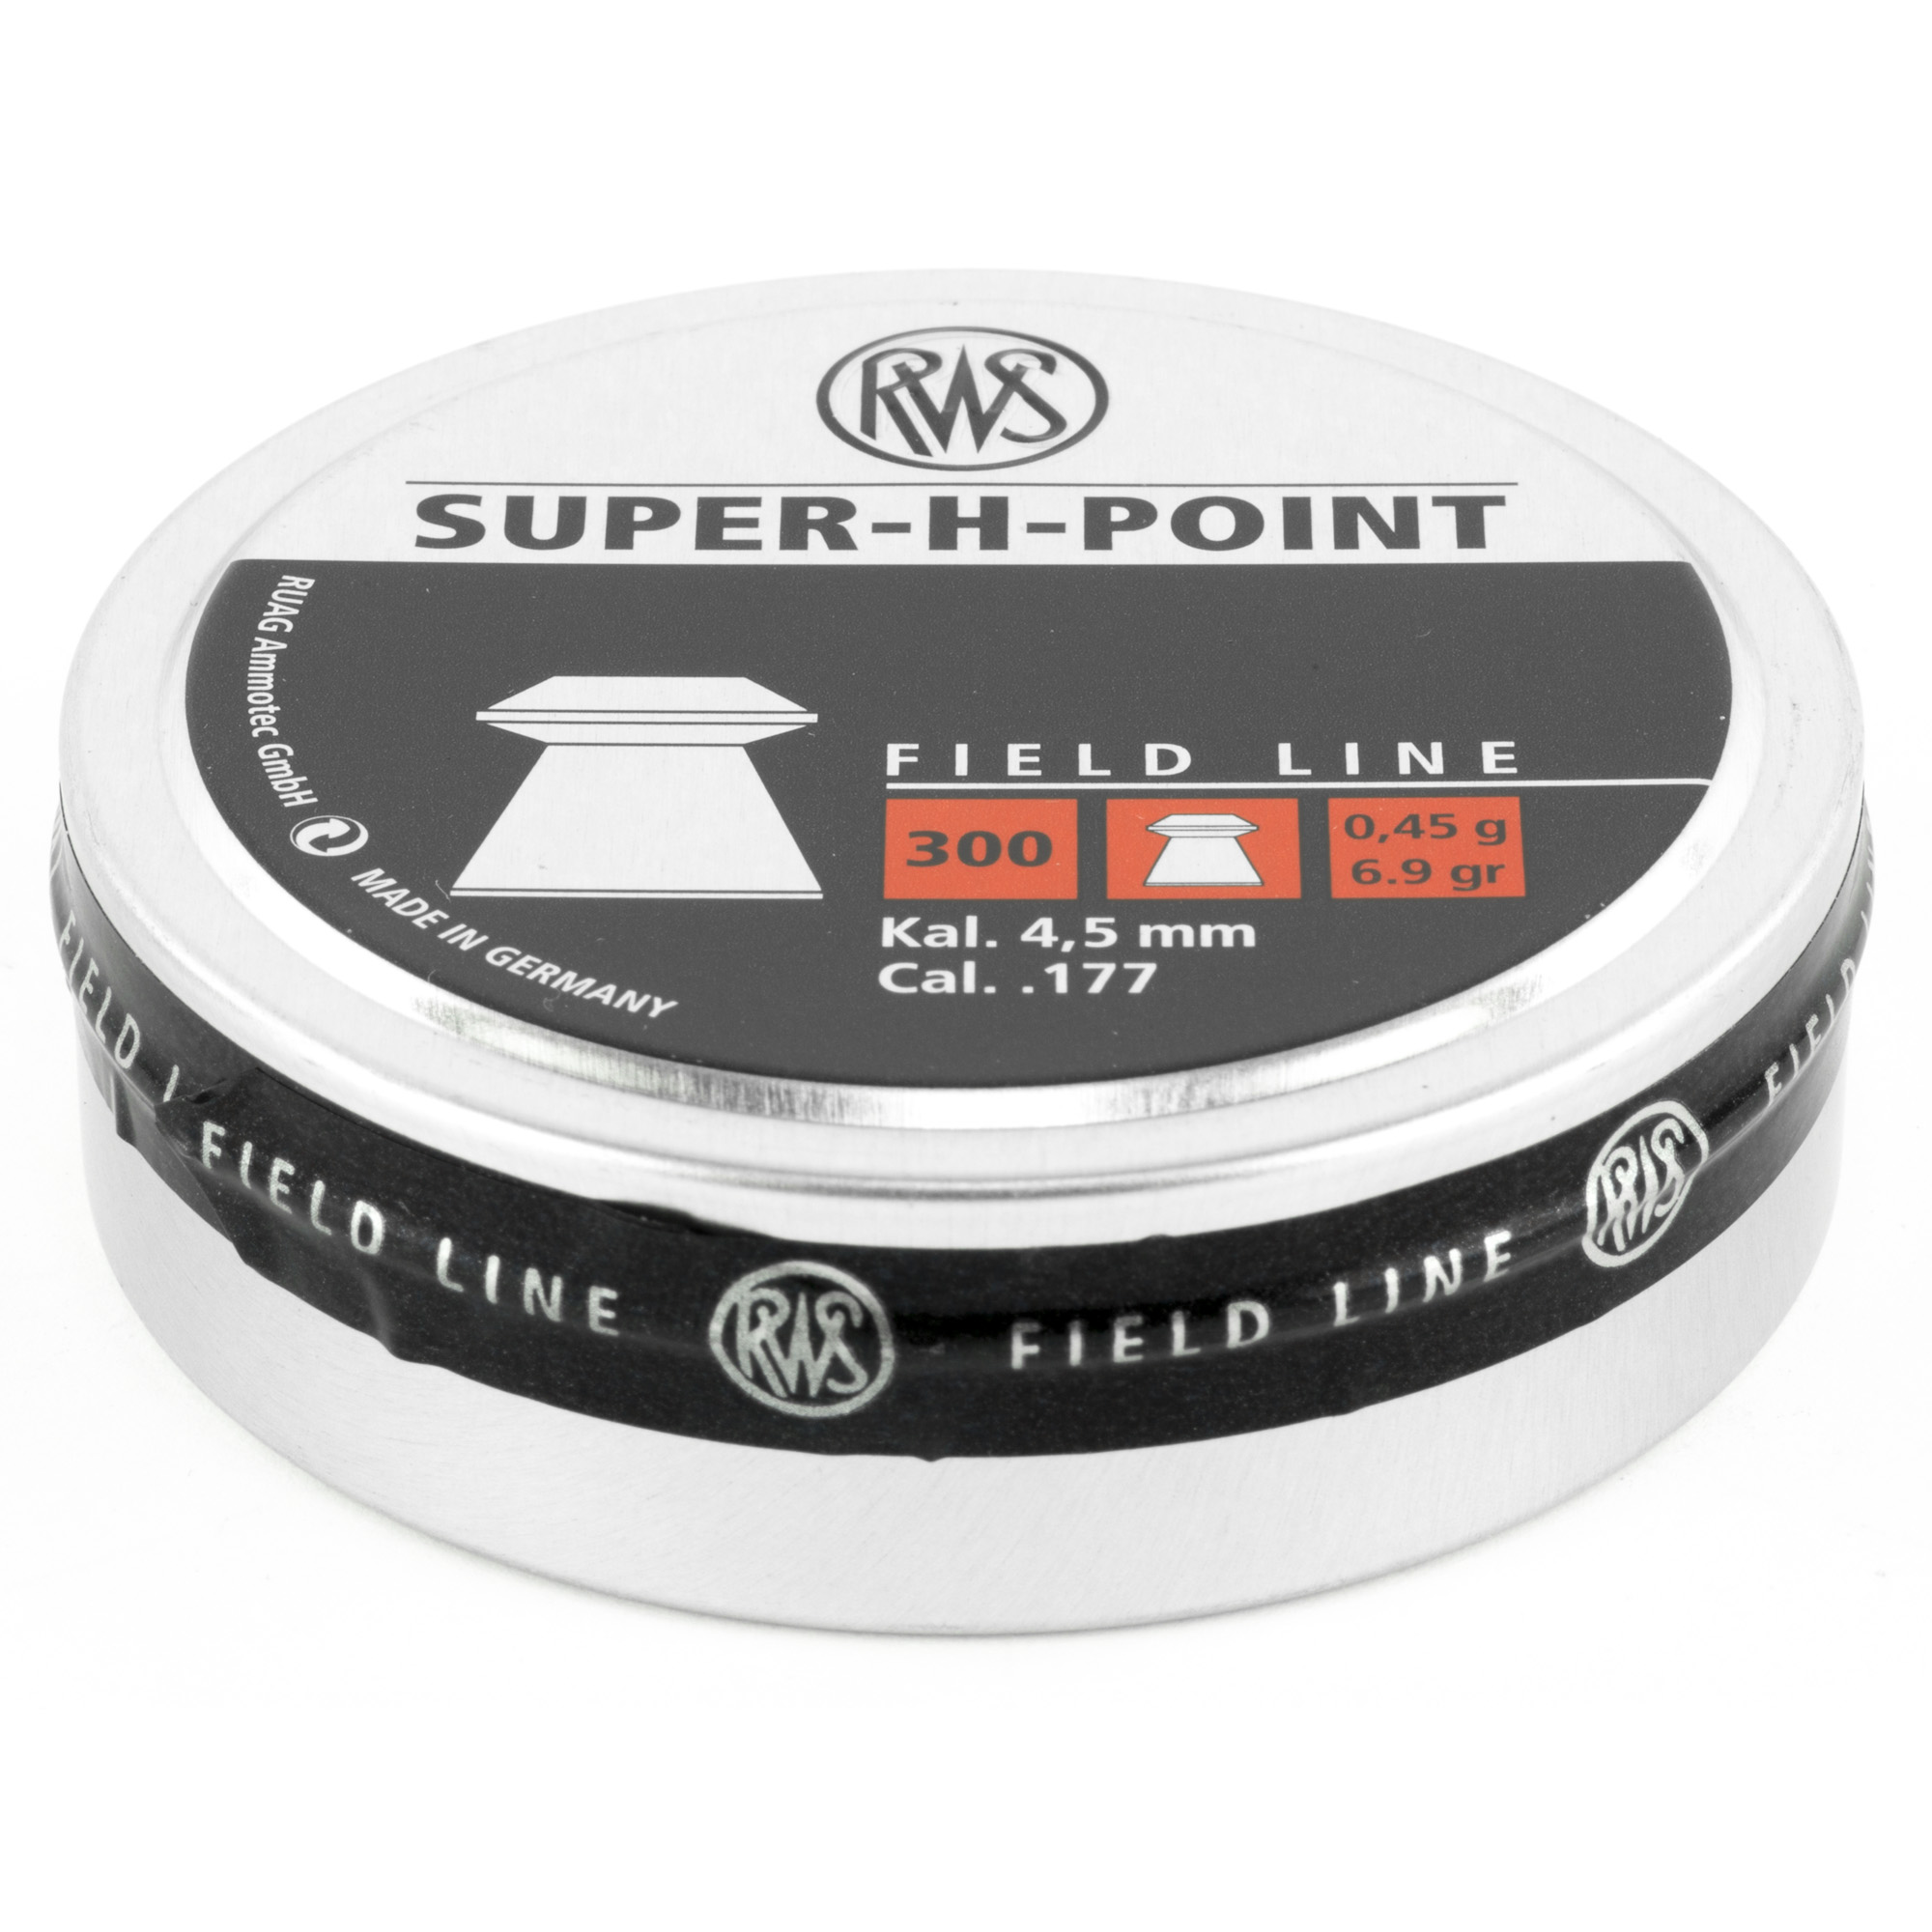 Rws Super H-point Fl .177 300-blstr-img-0